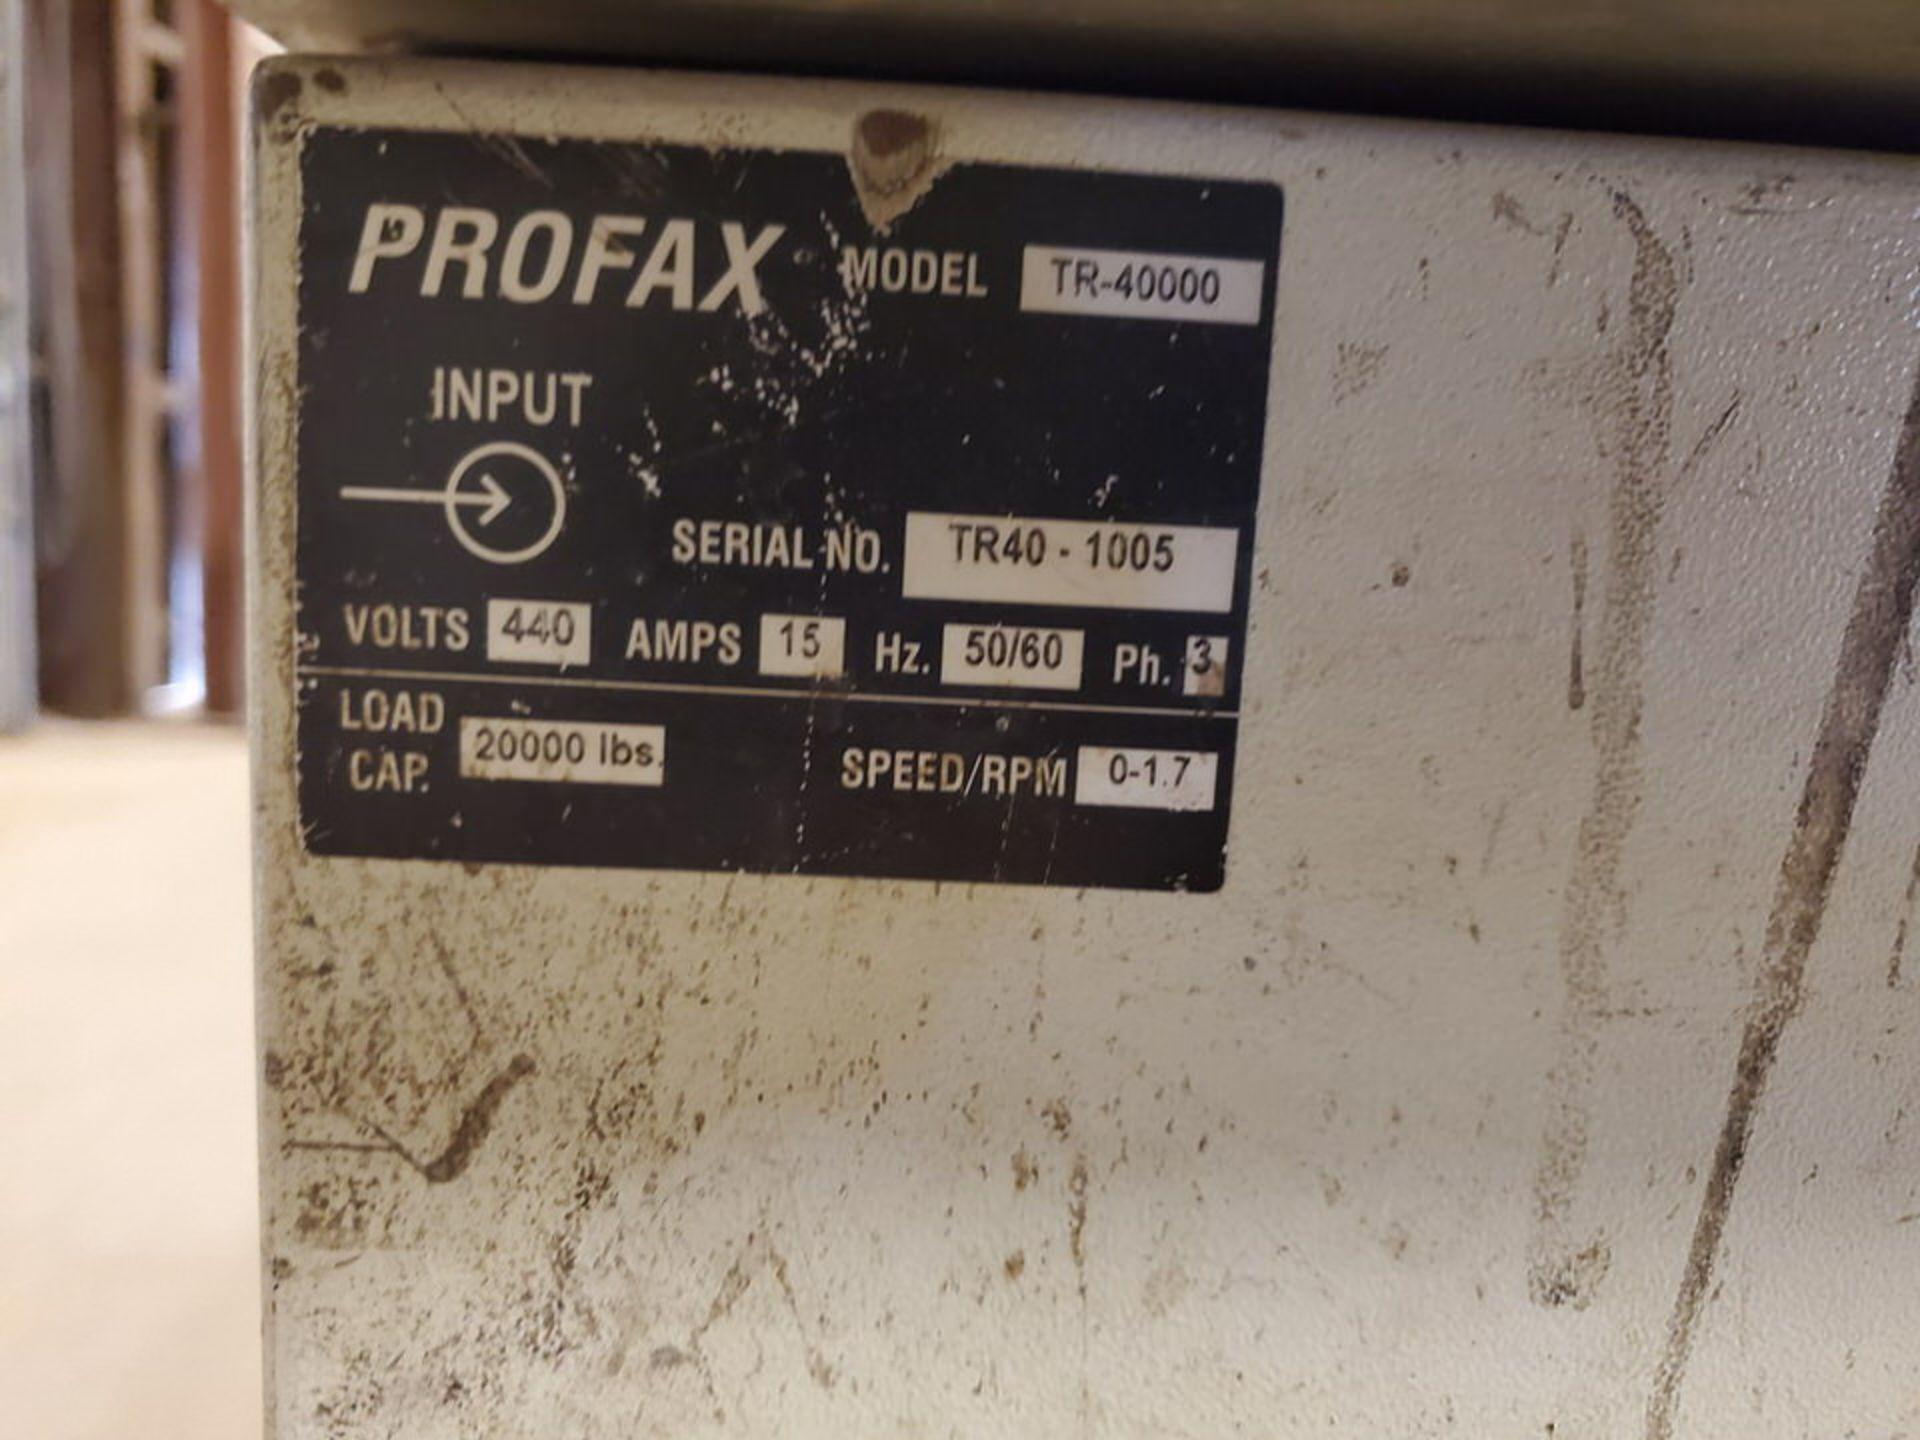 "Profax TR-40000 Turn Roll 20H Cap., 440V, 15A, 50/60HZ, 3PH, RPM: 0-1.7, 6"" Wheel Dia. - Image 8 of 8"